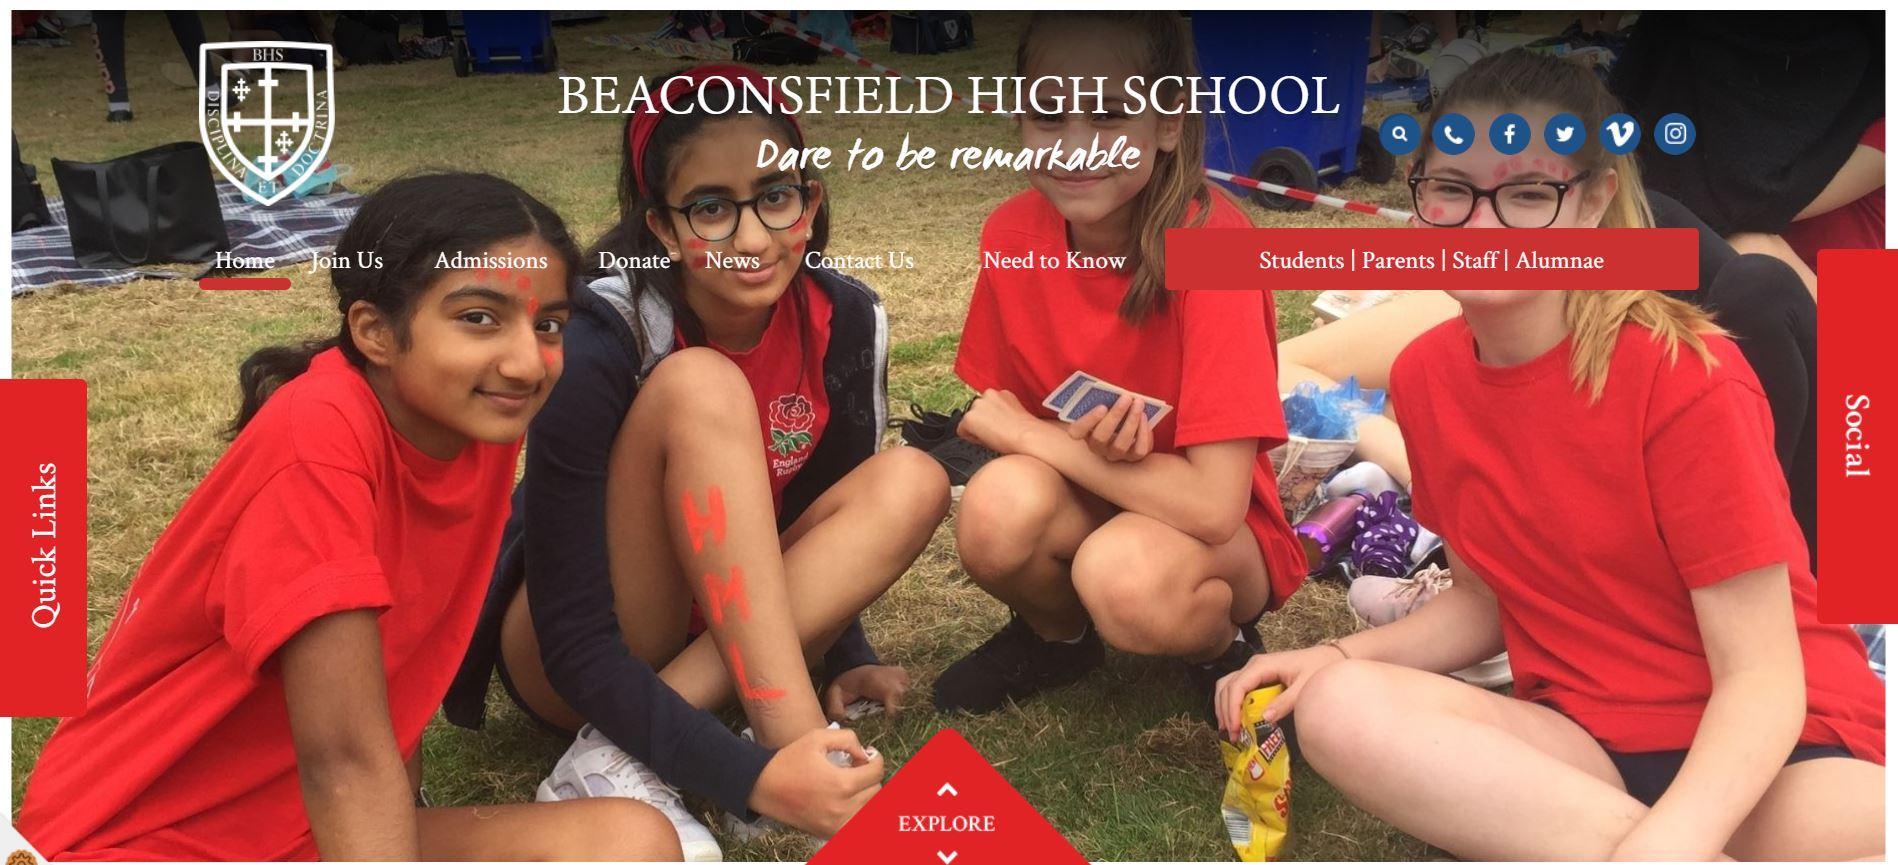 The Beaconsfield High School